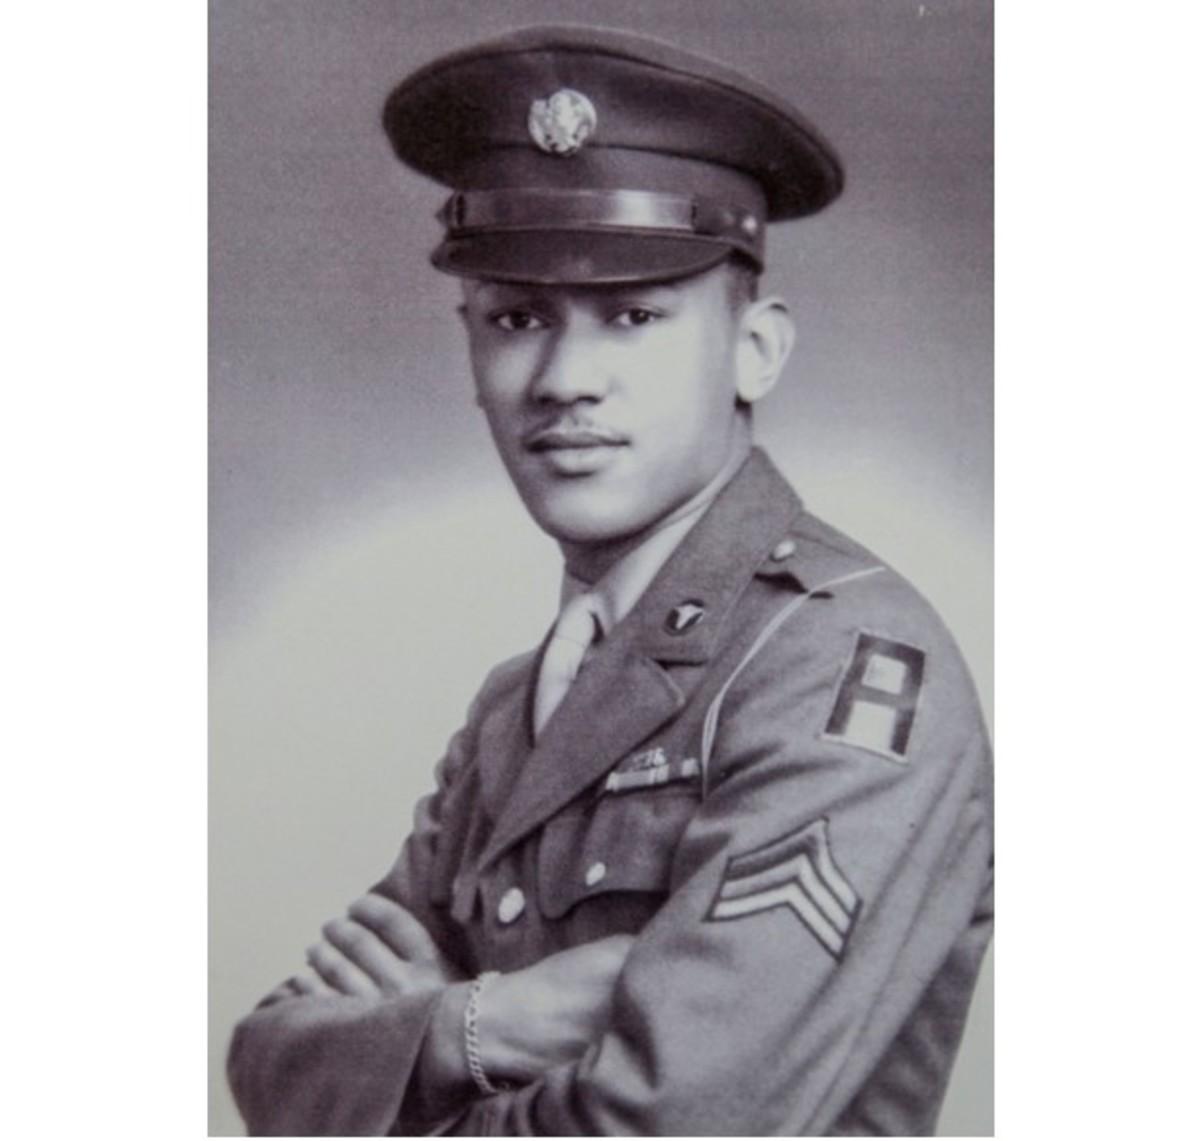 Staff Sergeant Waverly B. Woodson Jr.